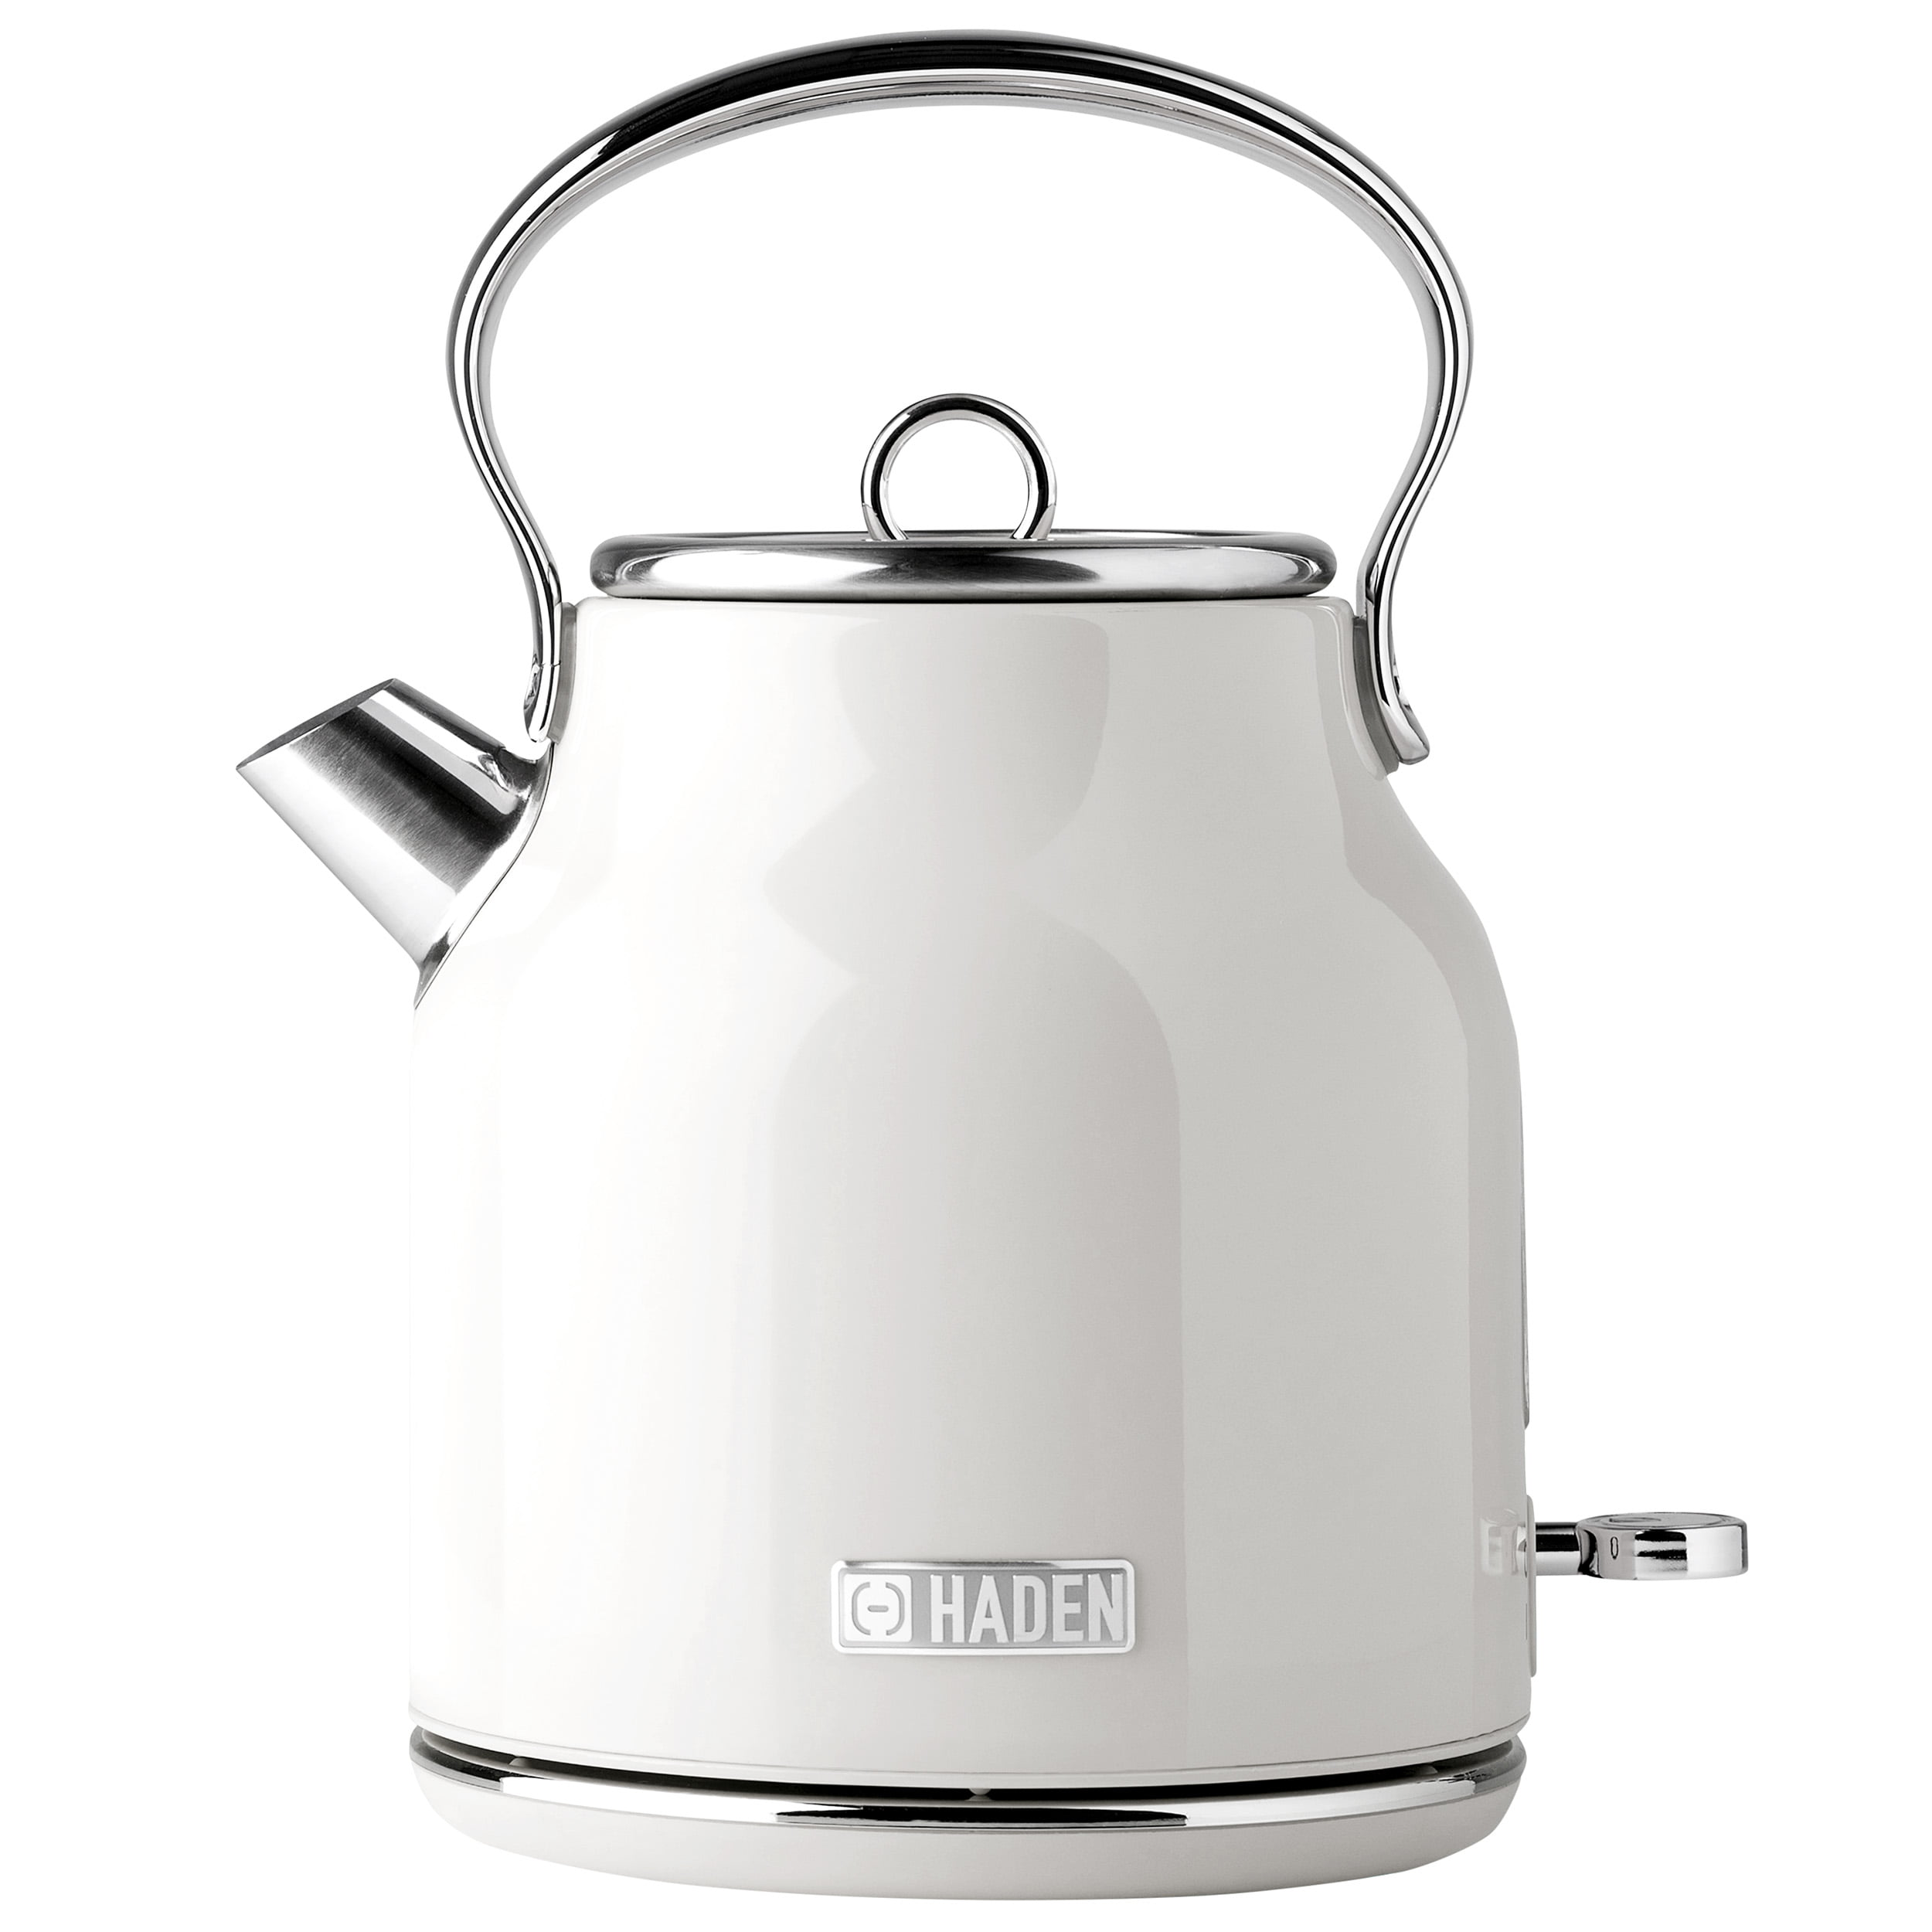 White Decor Boiler With Handle Small Kettle Planter Decor Tea Kettle